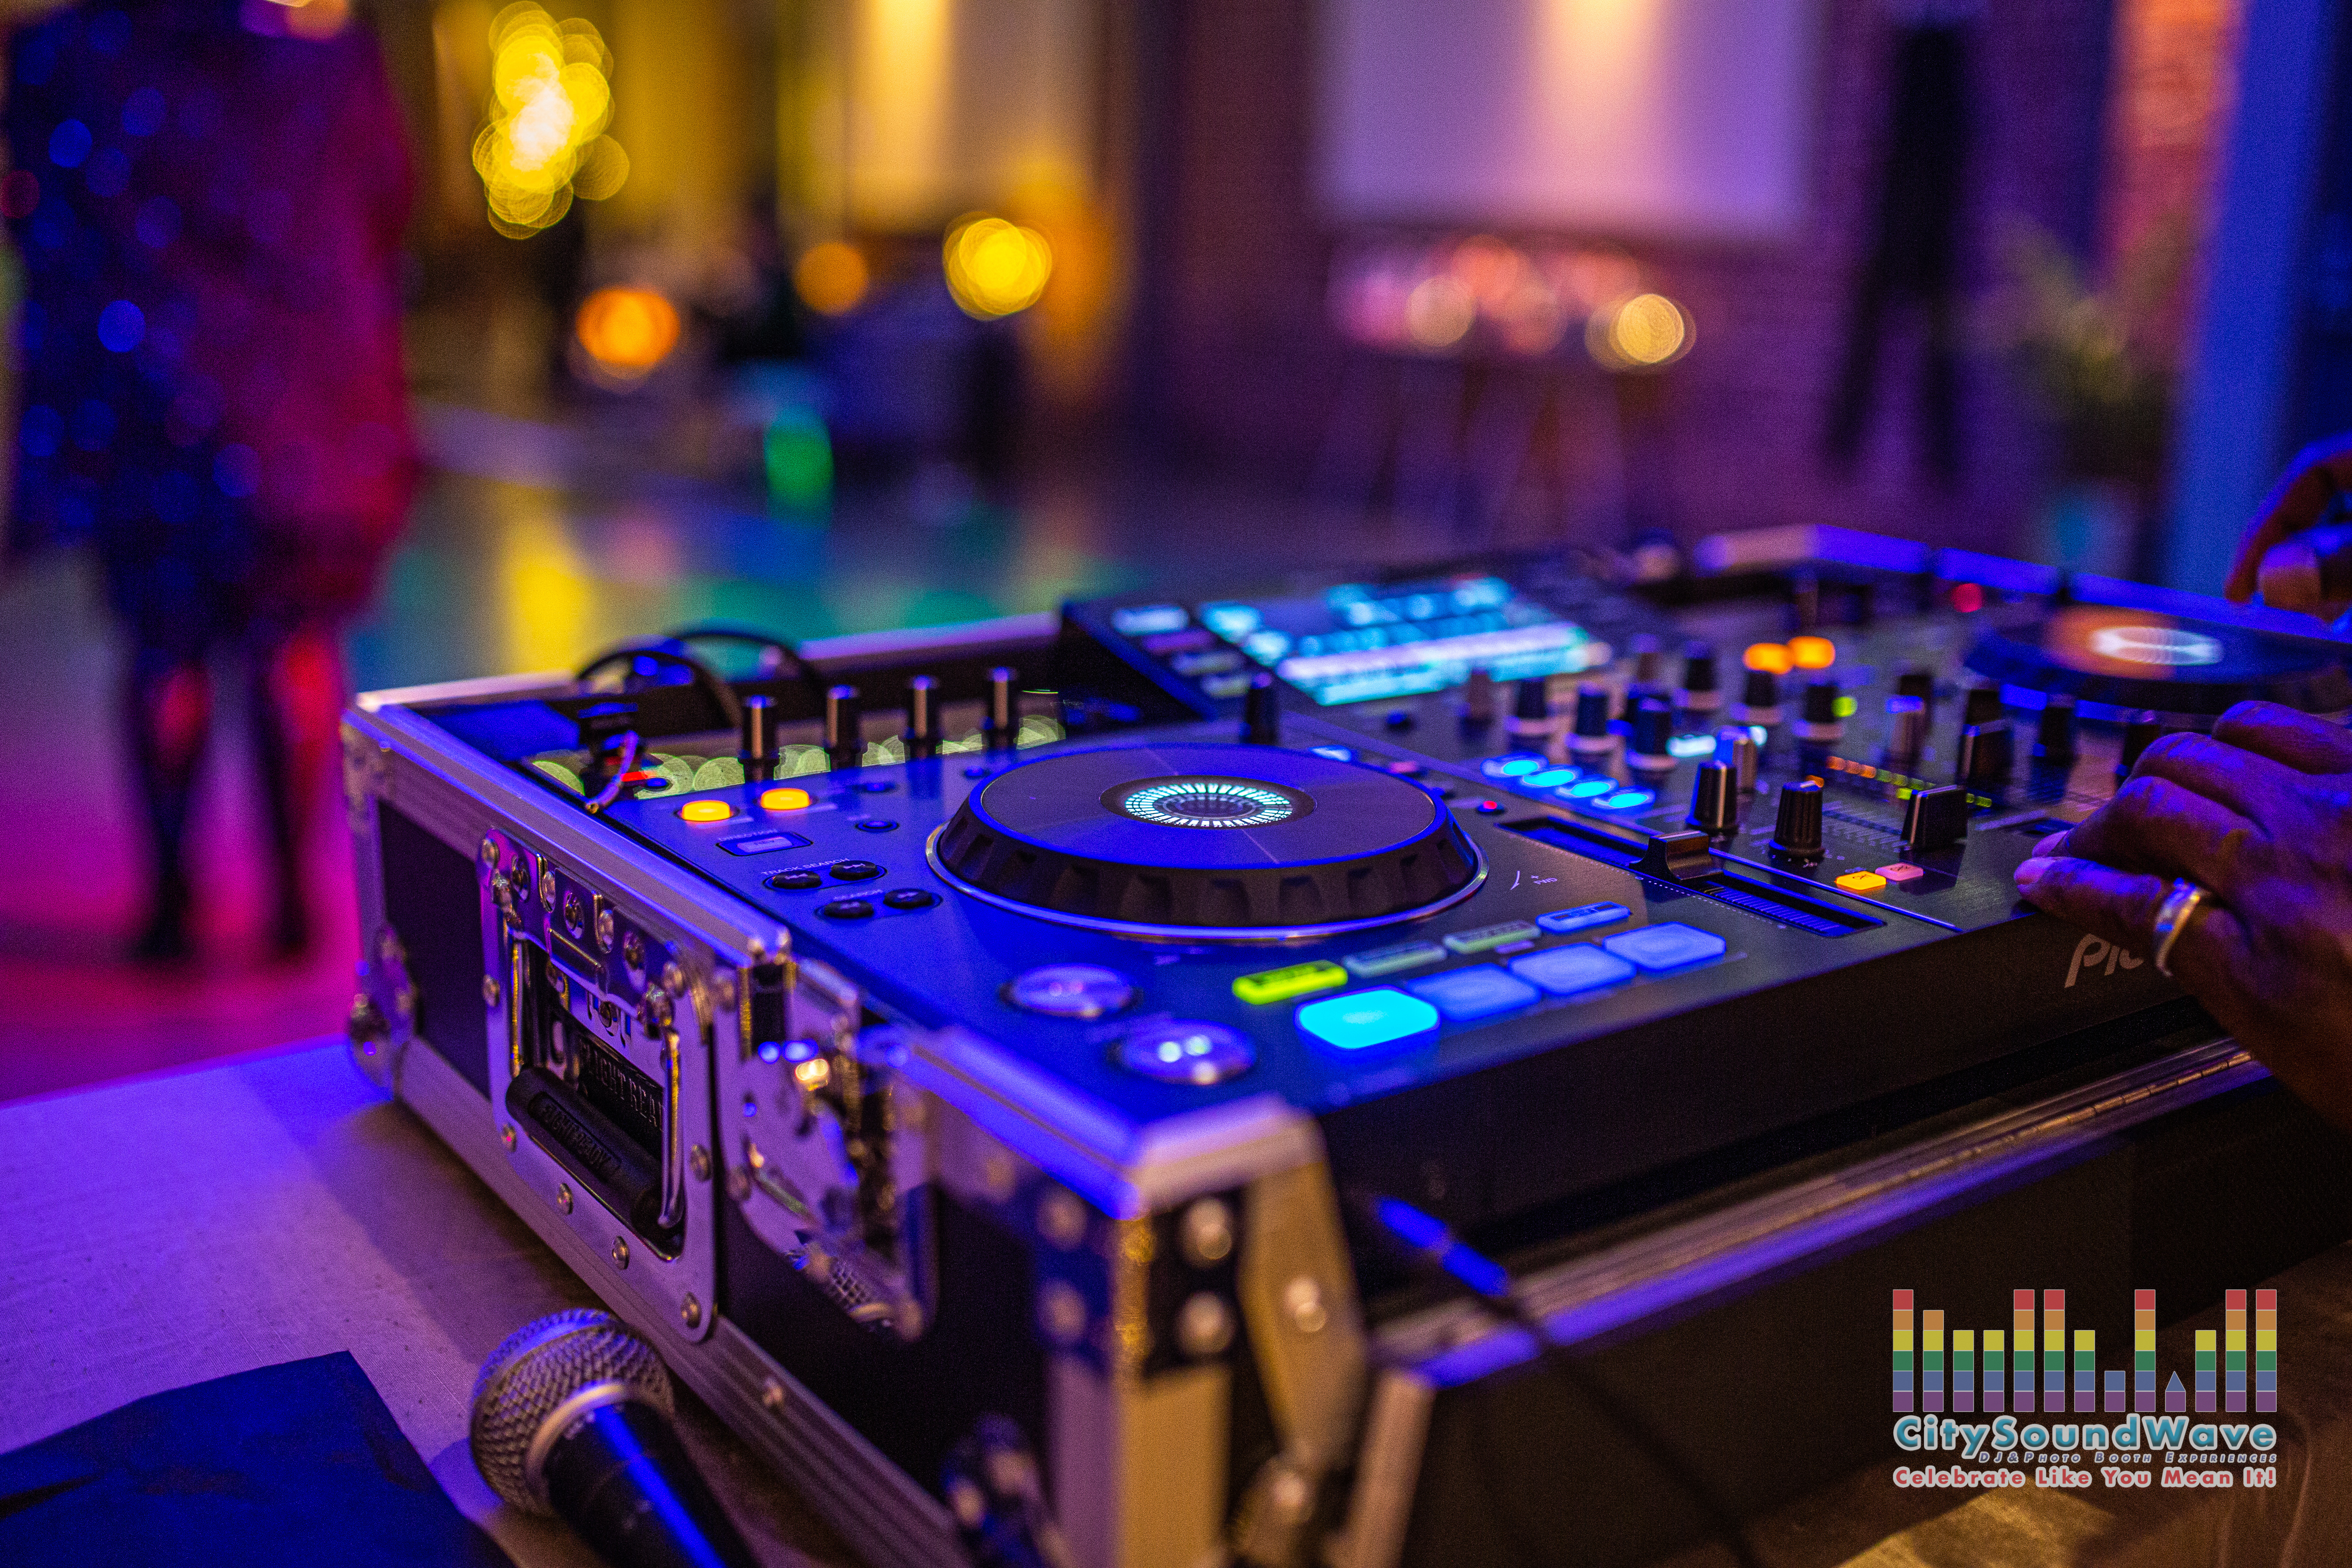 CitySoundWave DJ controller